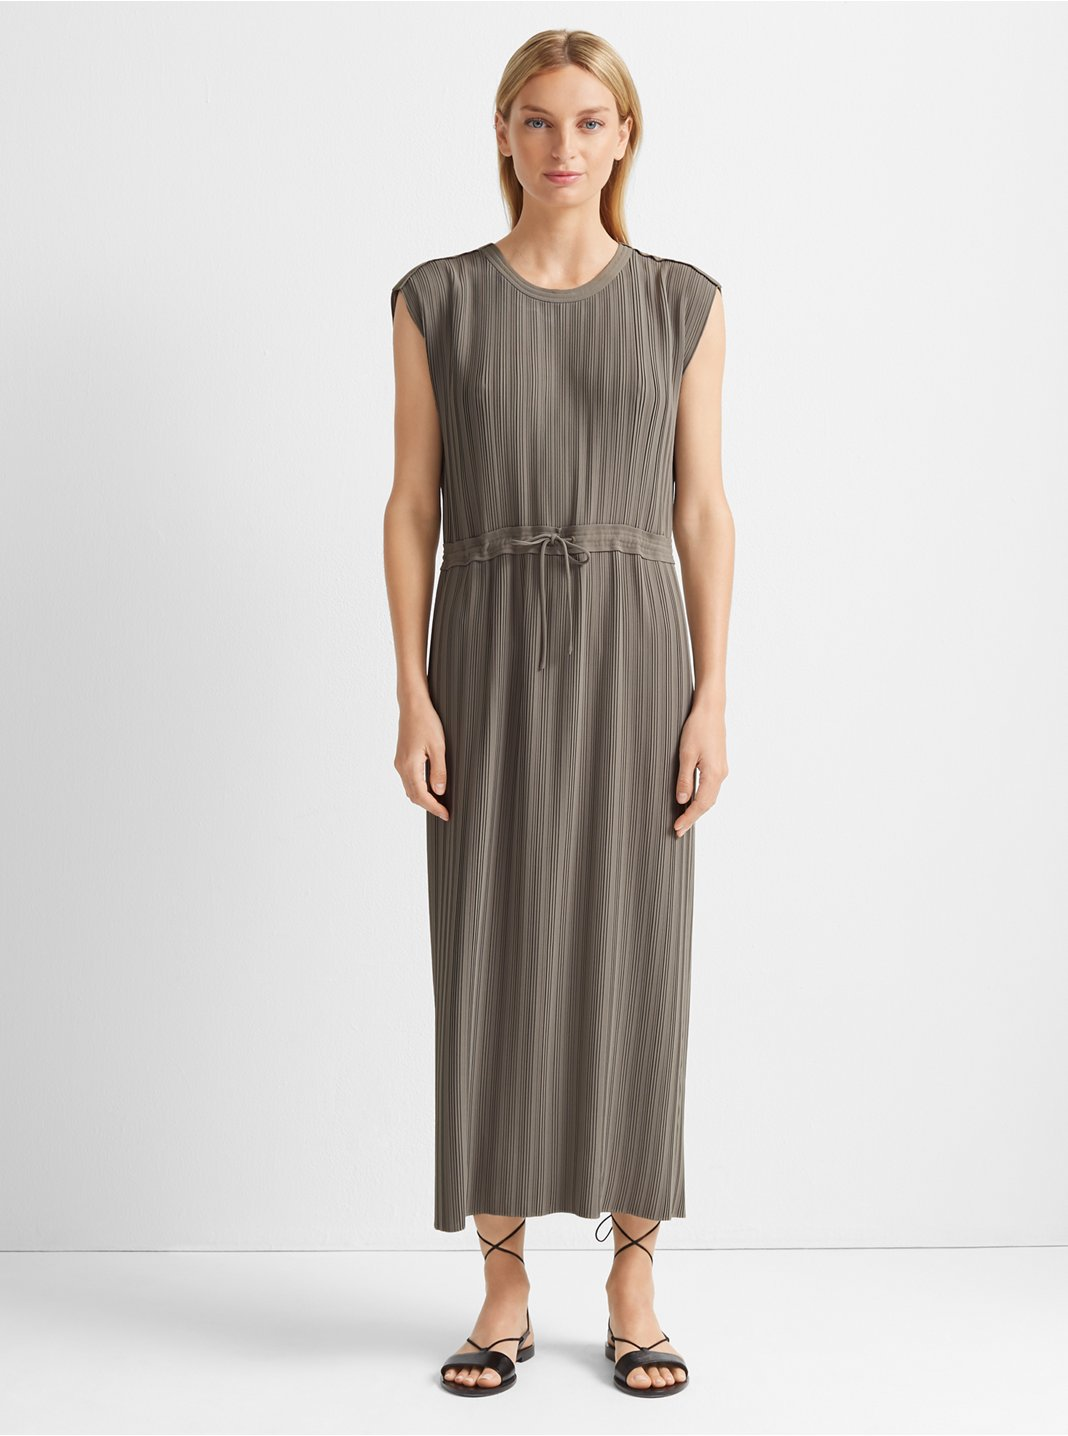 Woven Pleated Maxi Dress